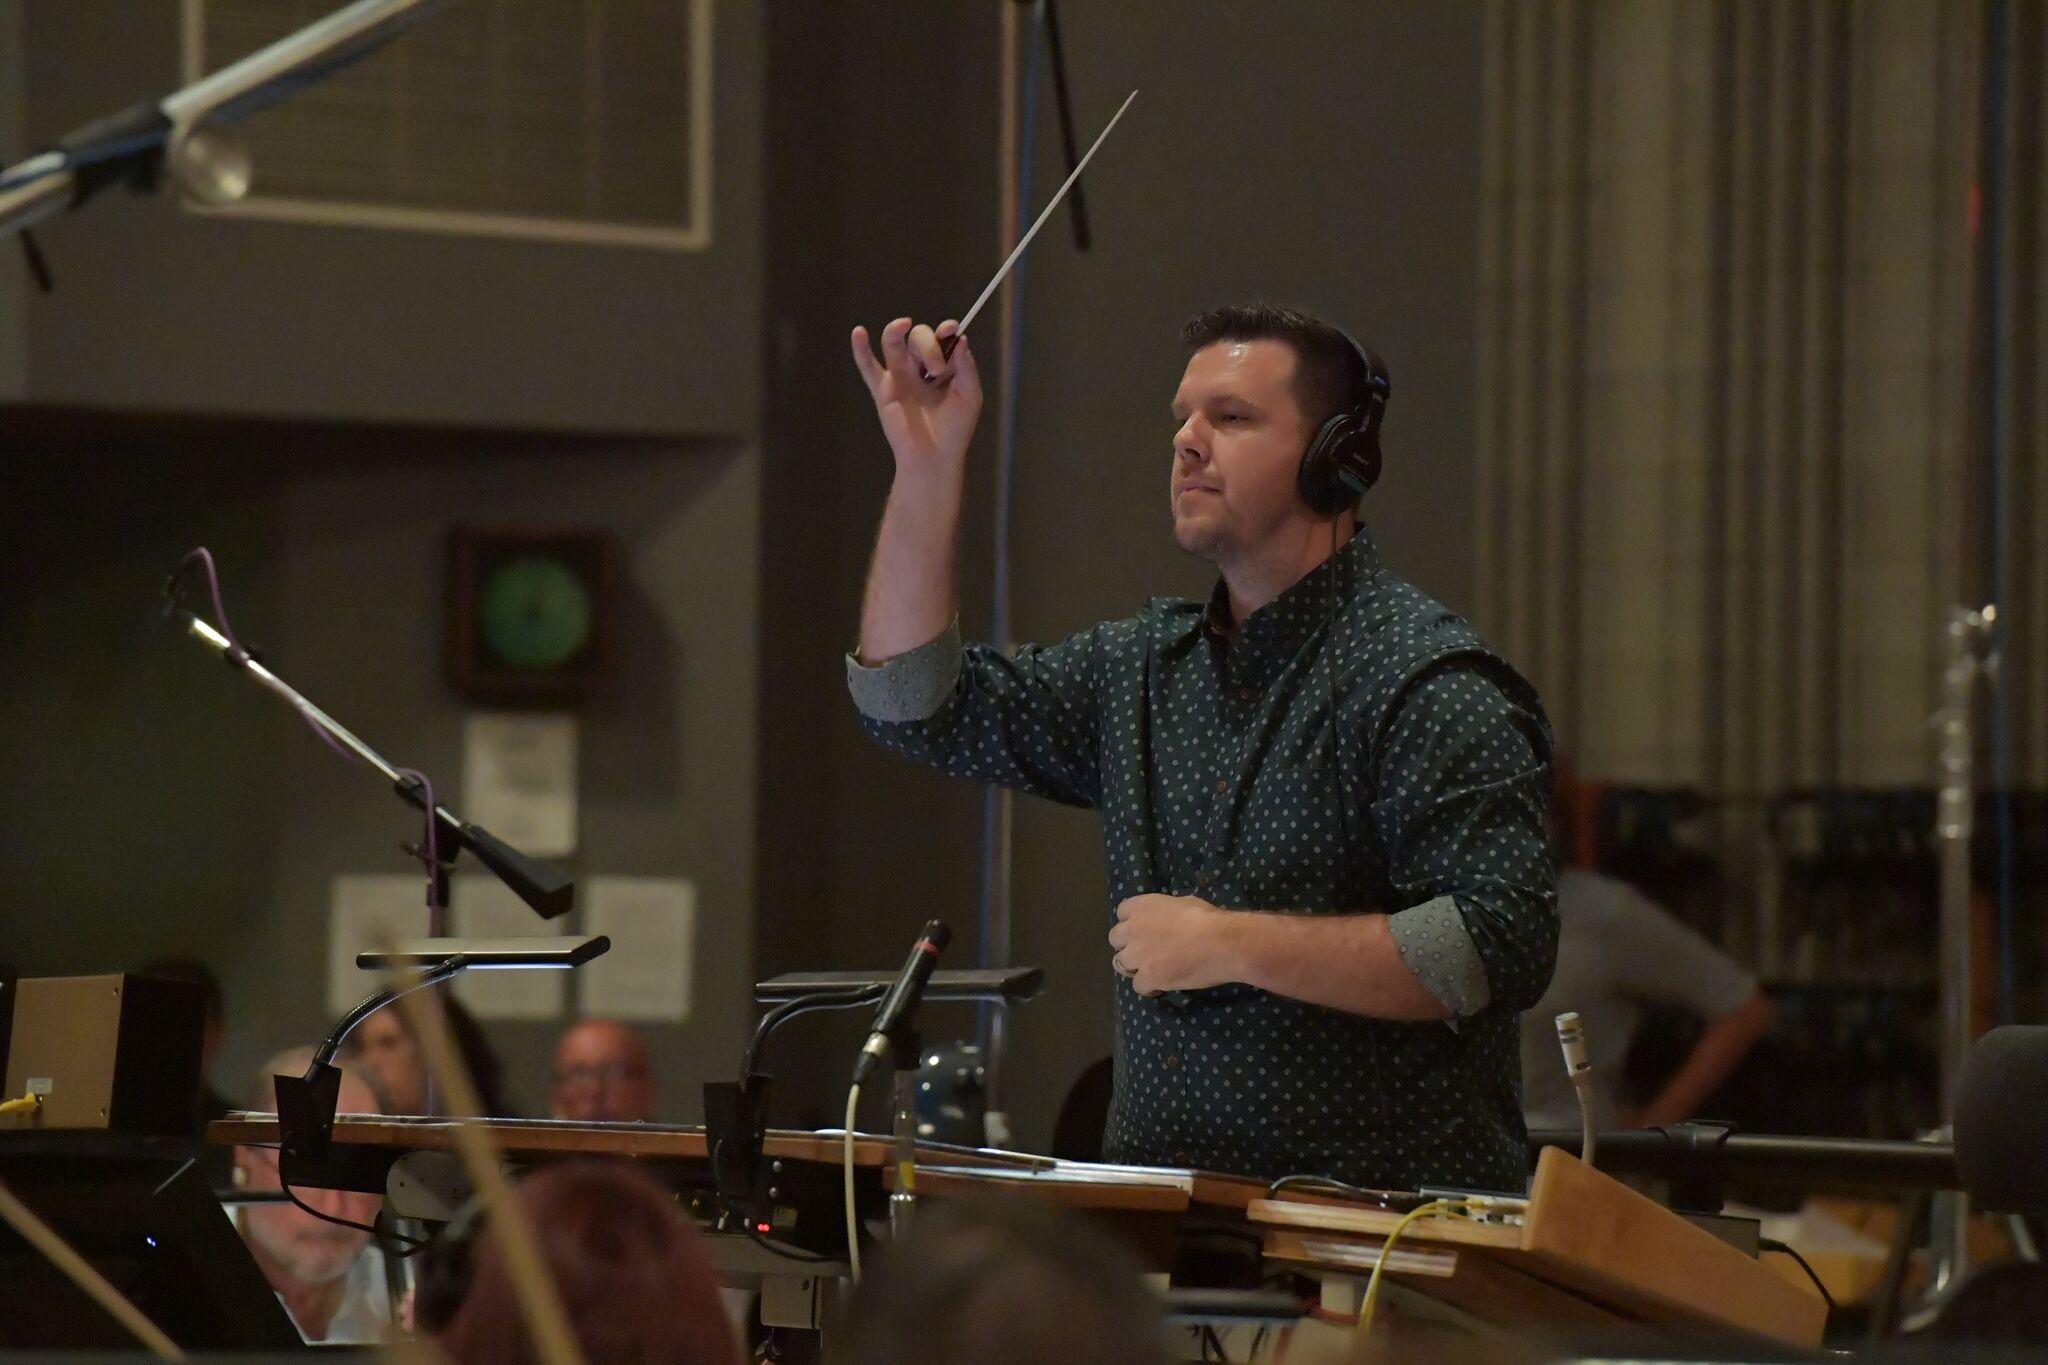 Pop Disciple PopDisciple ASCAP ASCAP Film Scoring Workshop Richard Bellis Michael Todd Jennifer Harmon Film Music Film Scoring Score Fred Smith